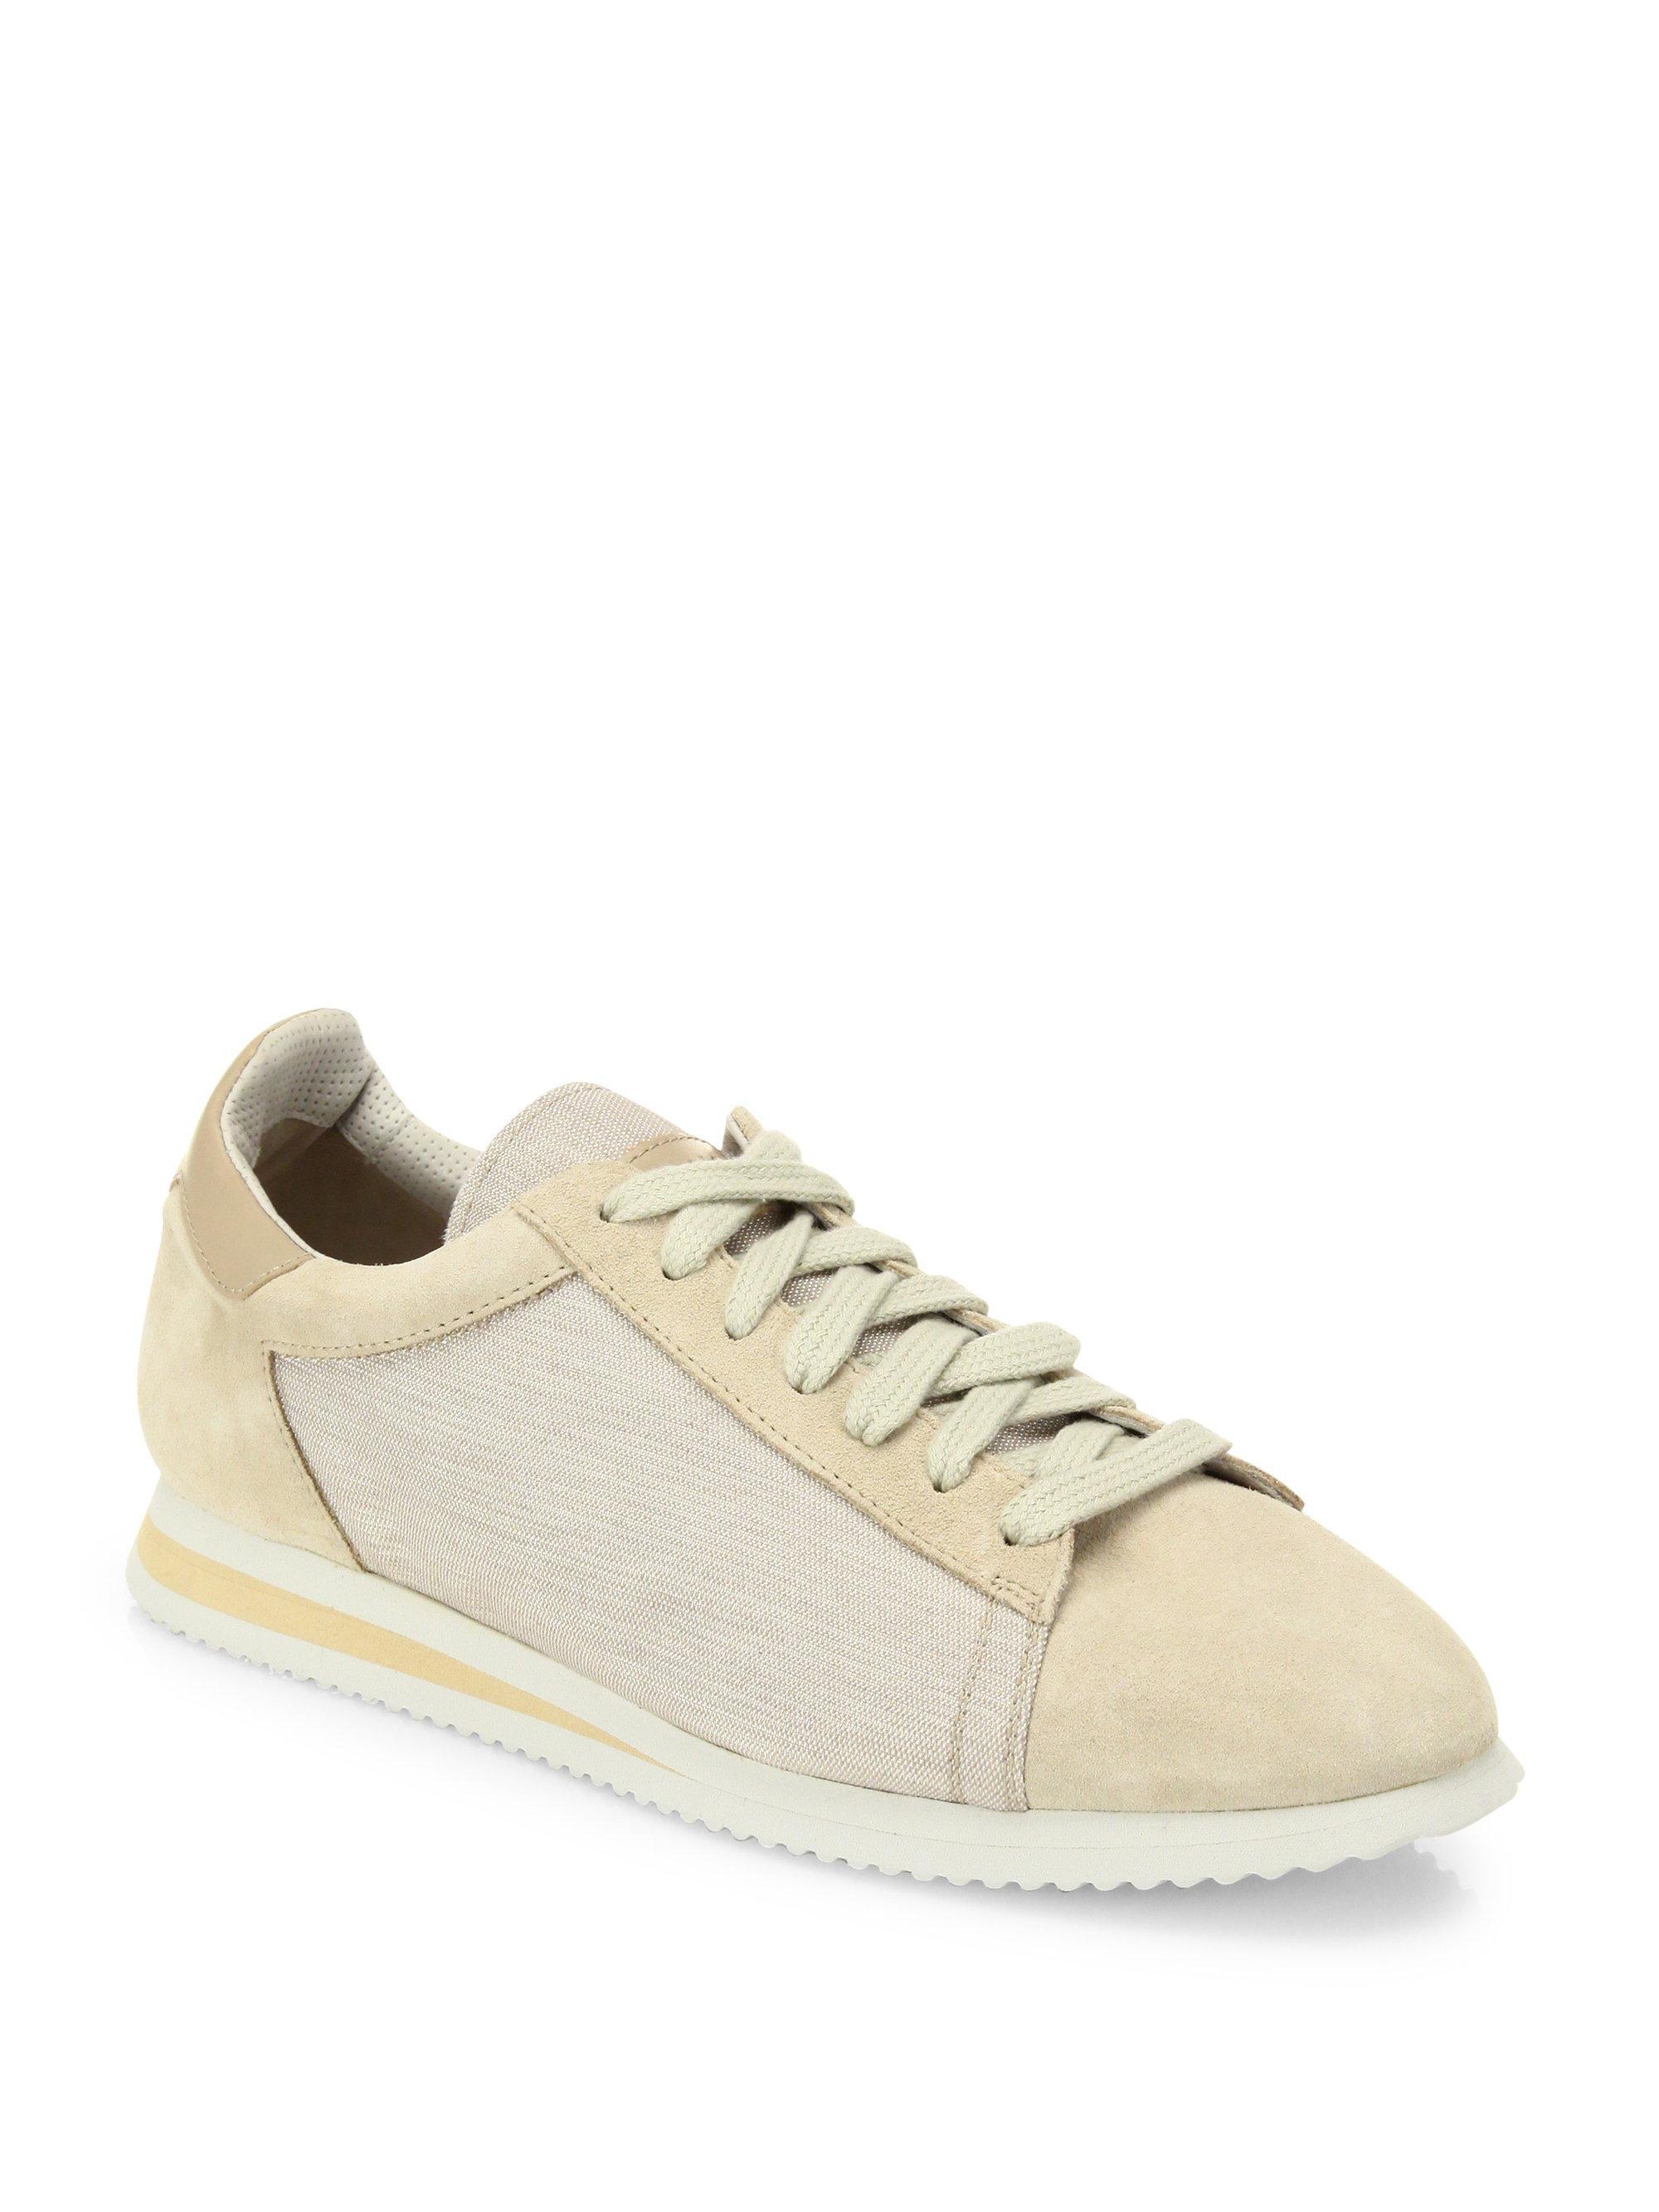 Colorblocked suede sneakers Brunello Cucinelli gZo3qW2